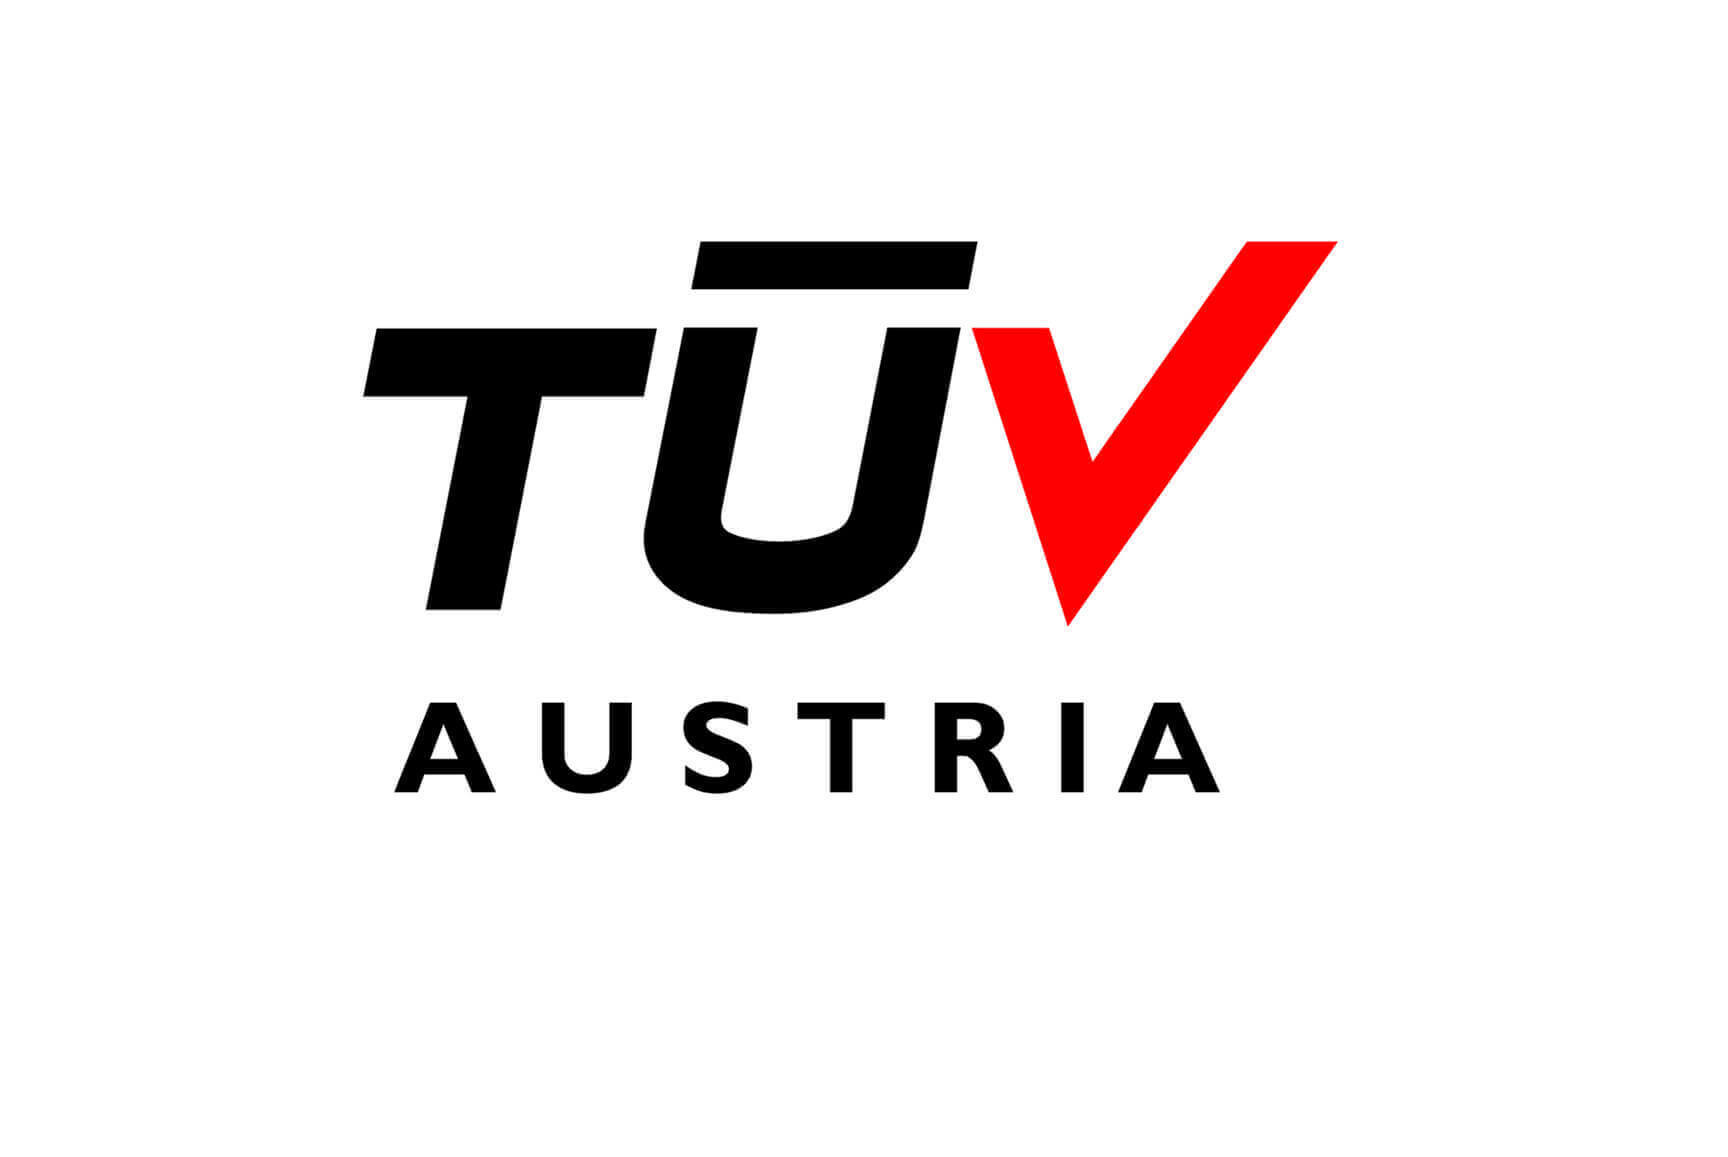 the terrafirma tuv certicicates are deleted by 4ward4x4